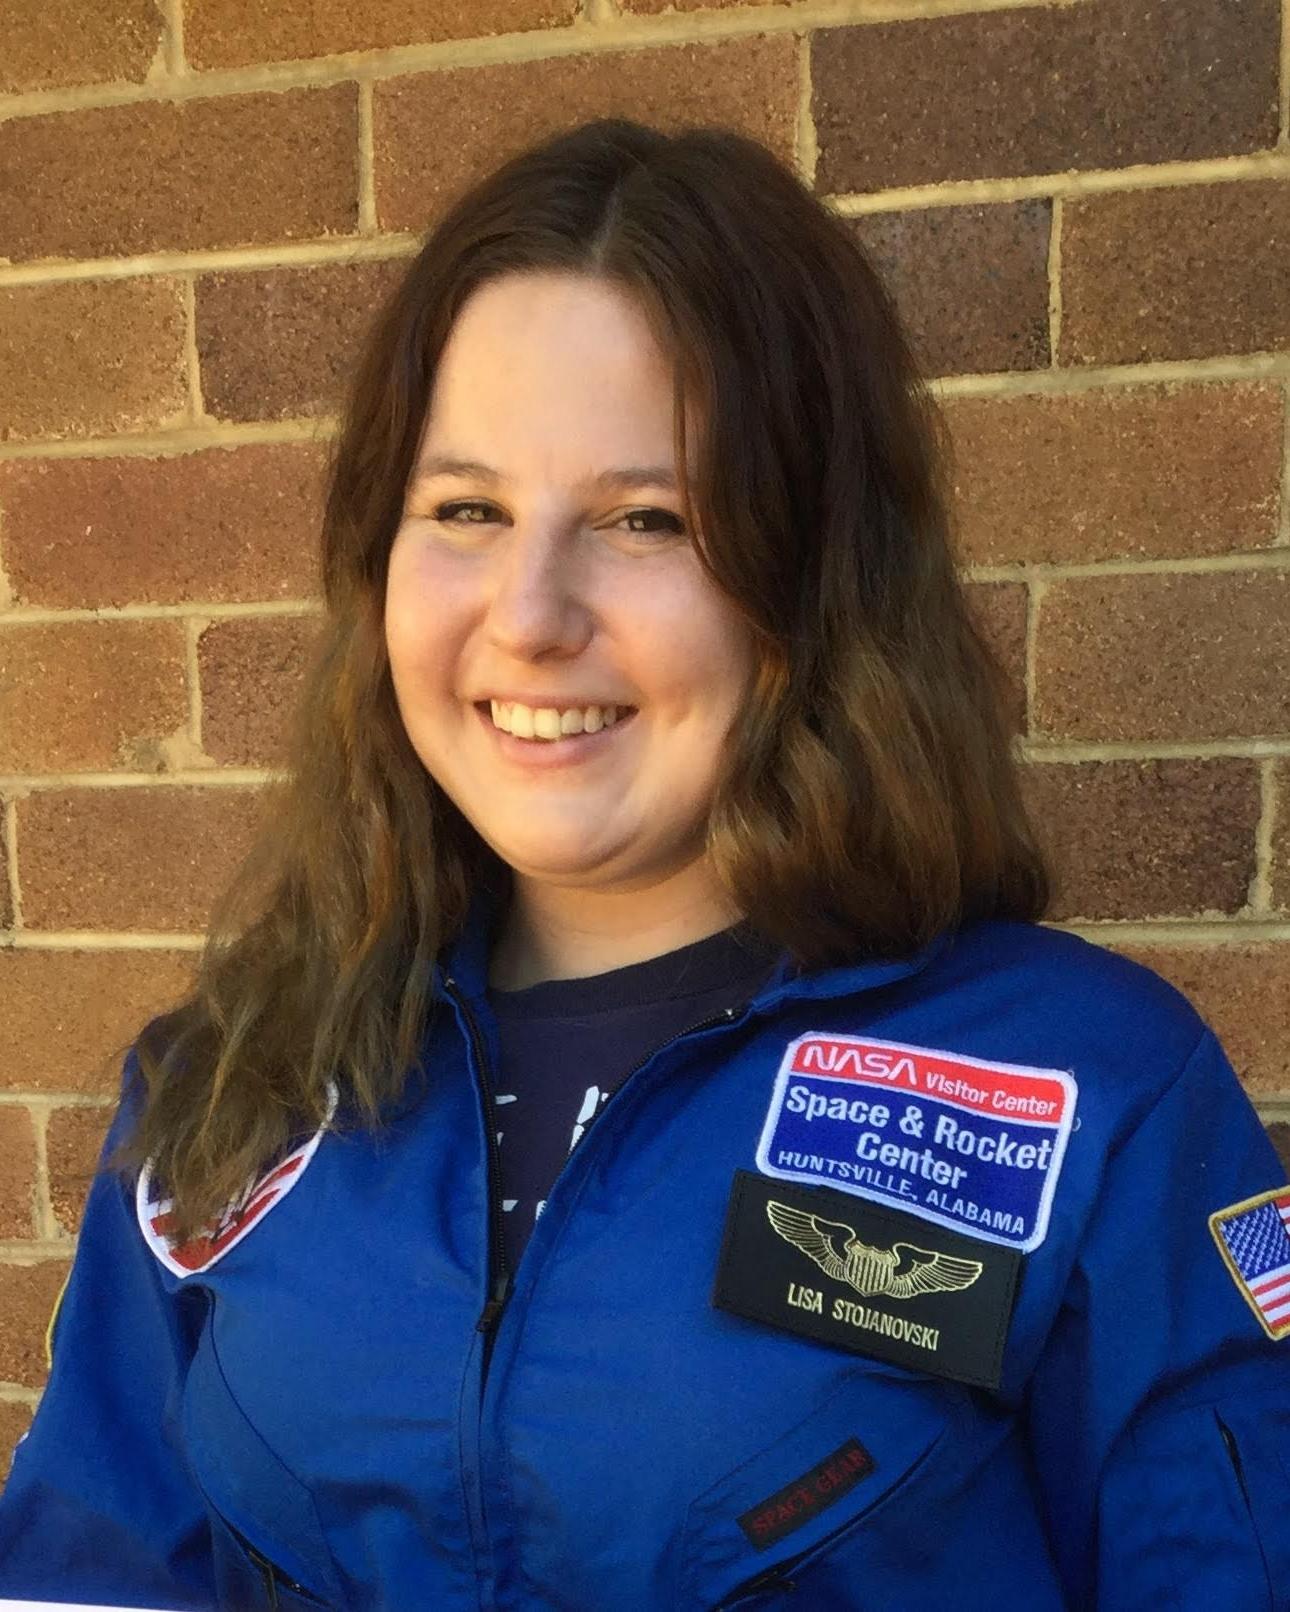 Lisa Stojanovski  TMRO:Space Correspondent